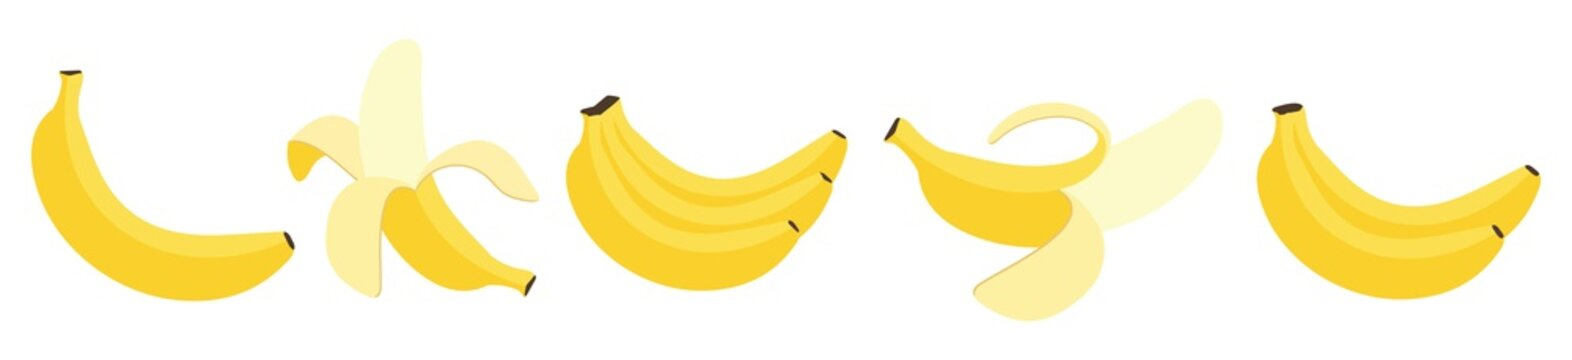 Cartoon bananas. Peel banana,  isolated on white background,  banana icon vector illustration set